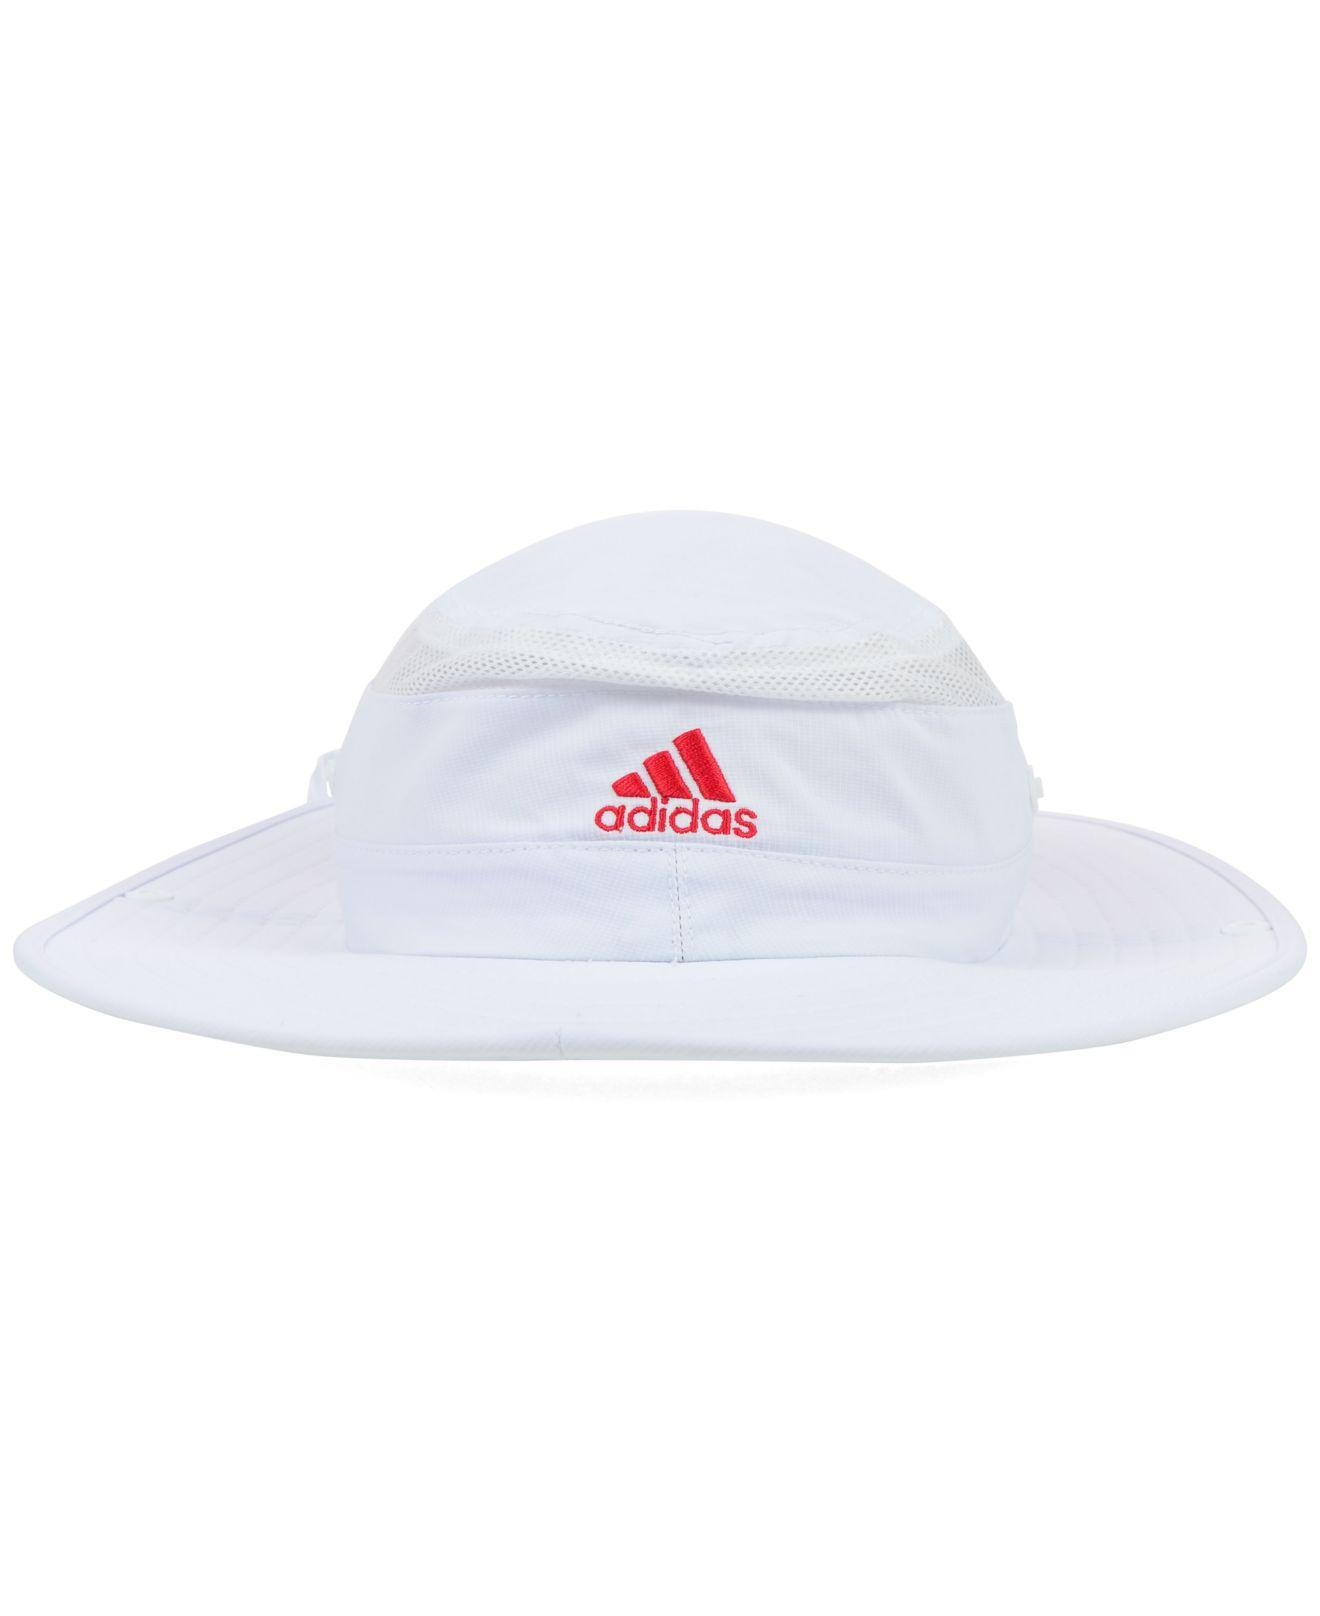 923d5426837 Lyst - adidas North Carolina State Wolfpack Campus Safari Hat in ...